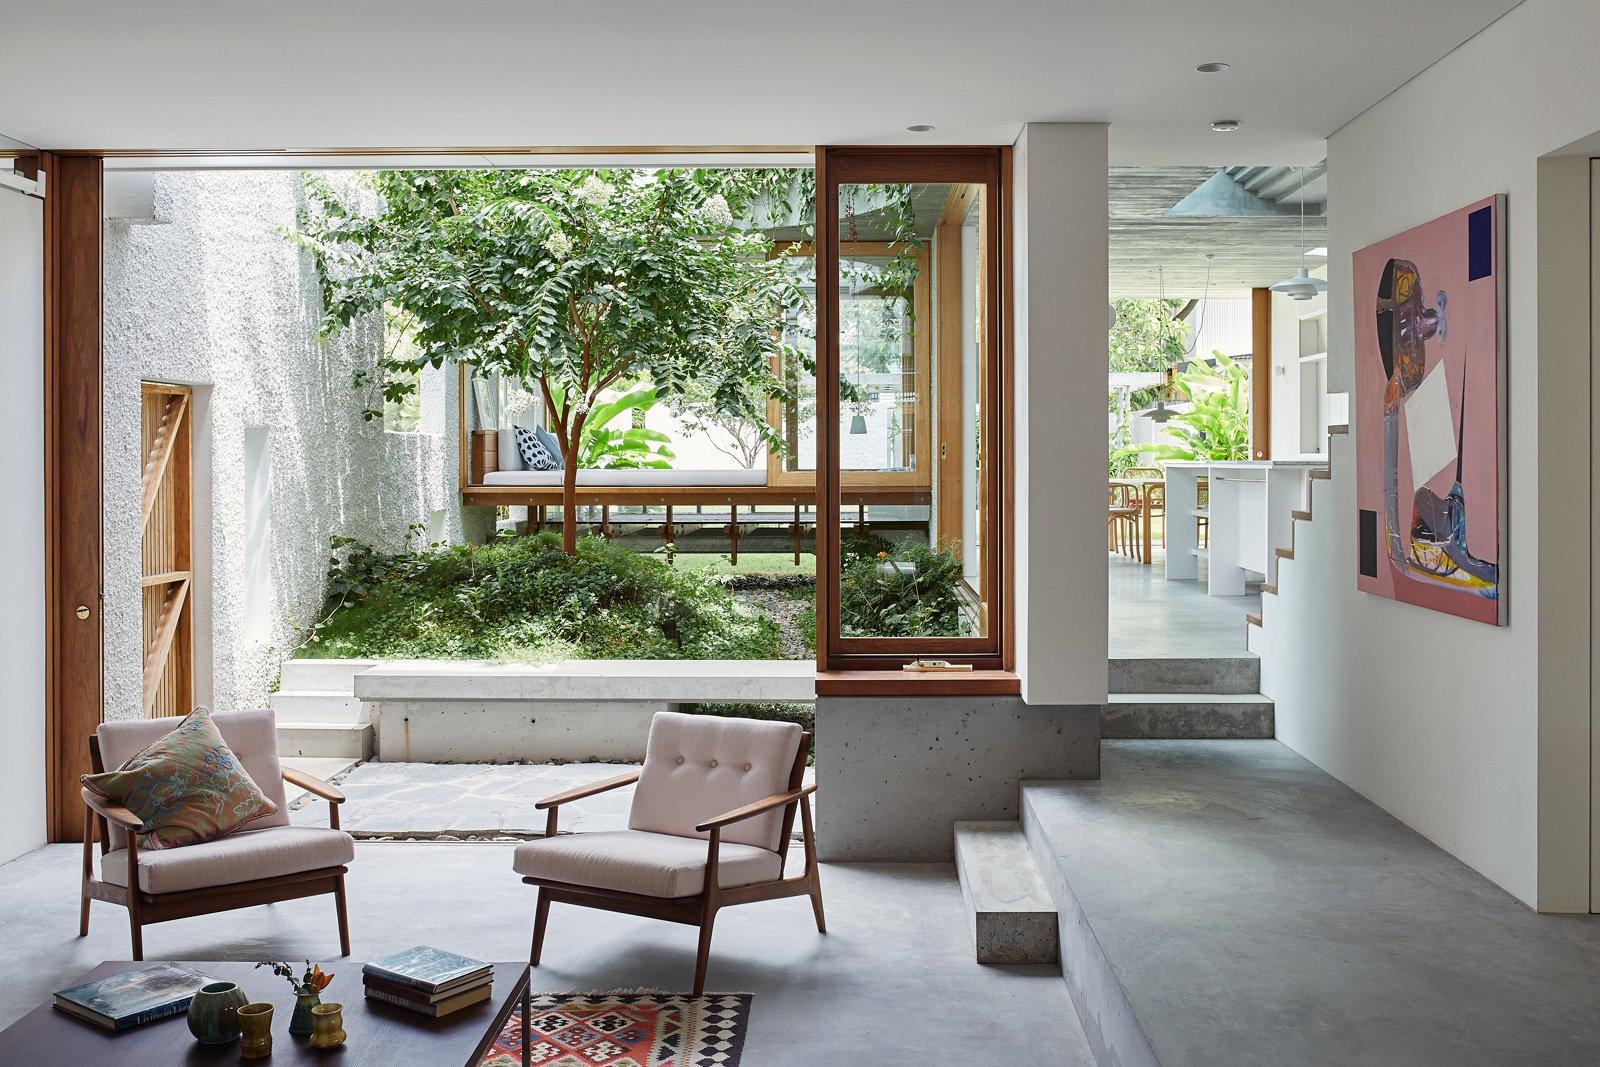 An Australian Cottage Gets a Mediterranean-Inspired Revamp